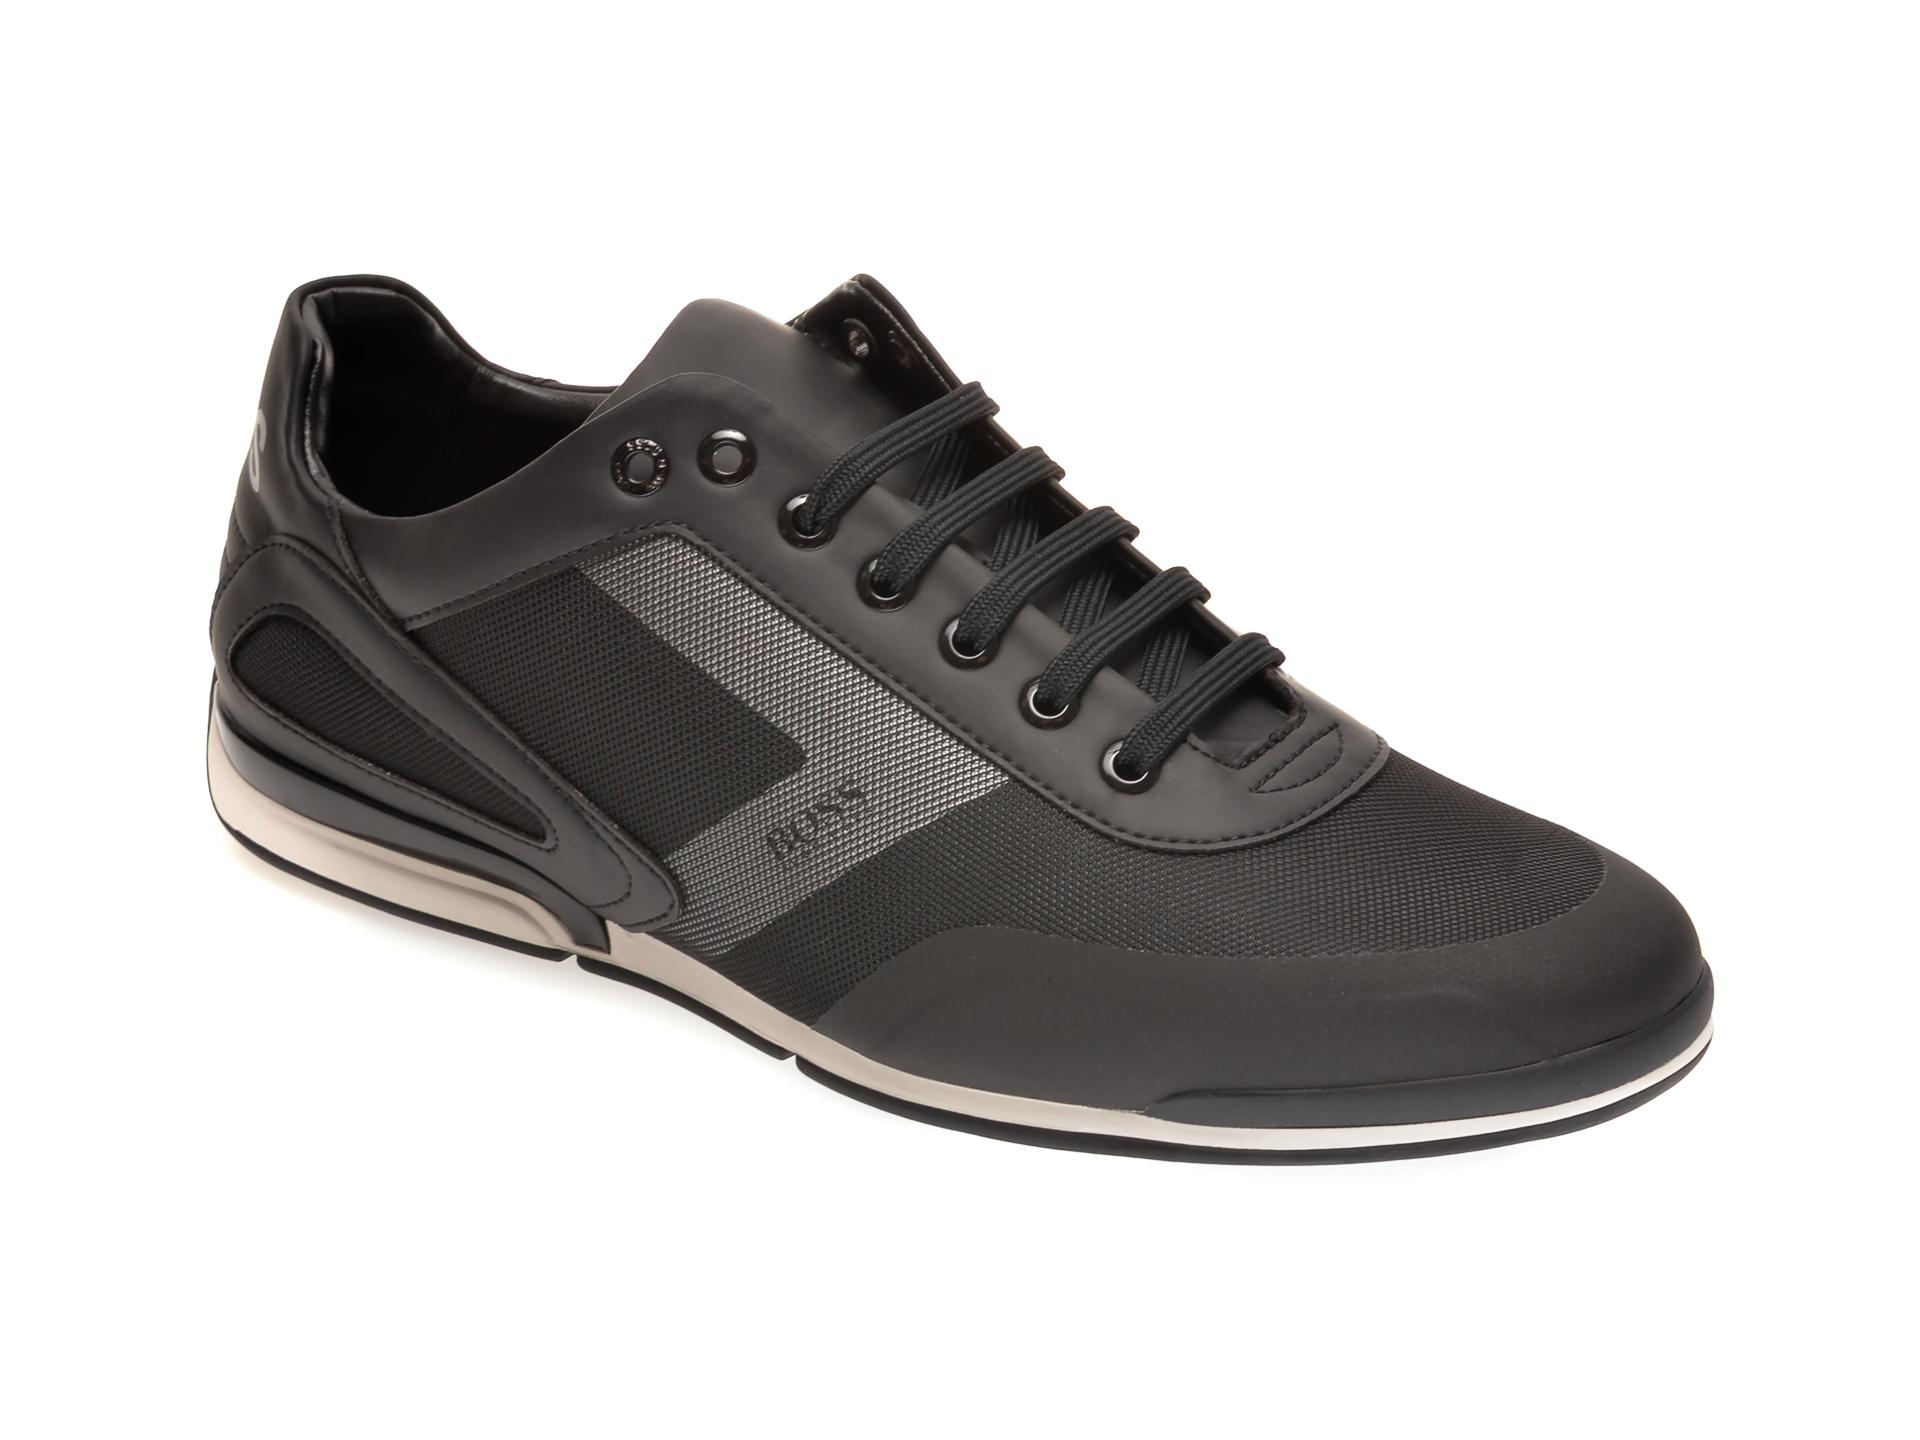 Pantofi Sport Hugo Boss Negri, 9553, Din Material Textil Si Piele Ecologica